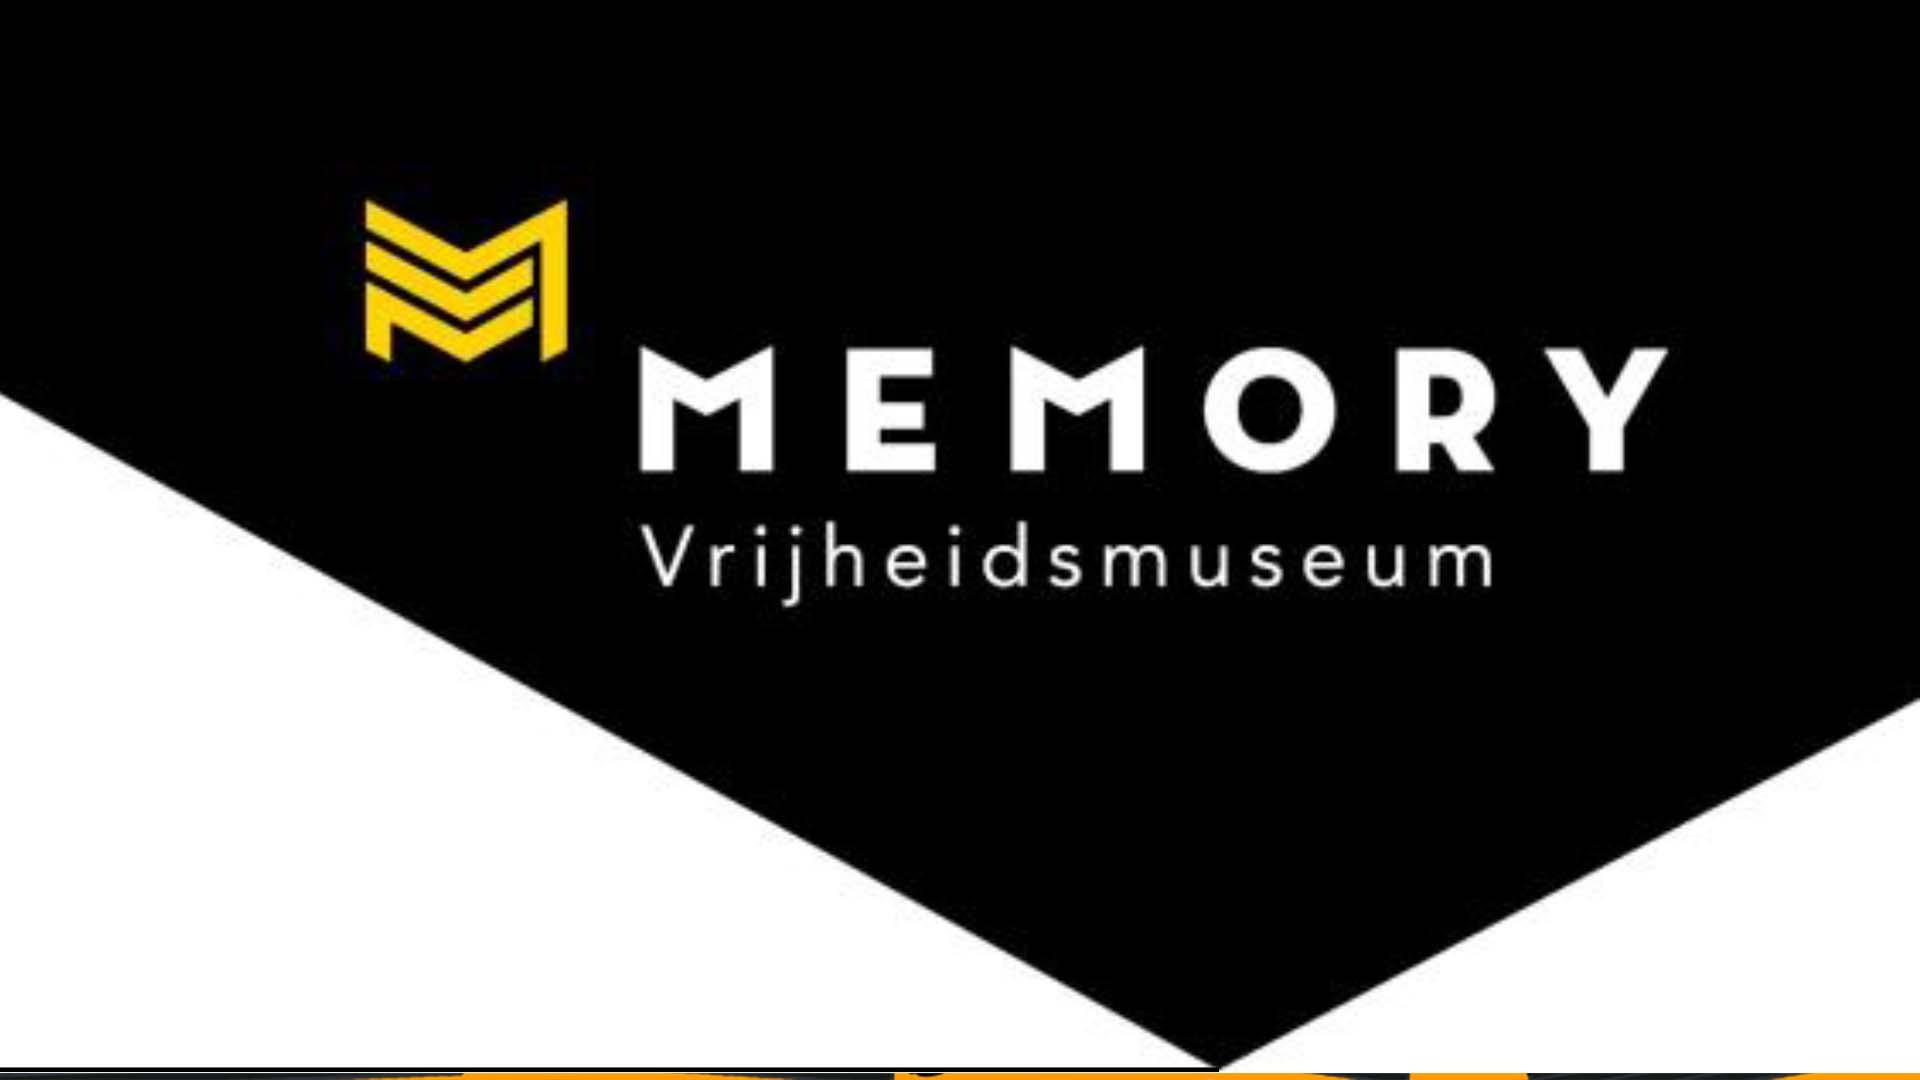 Memory Vrijheidsmuseum